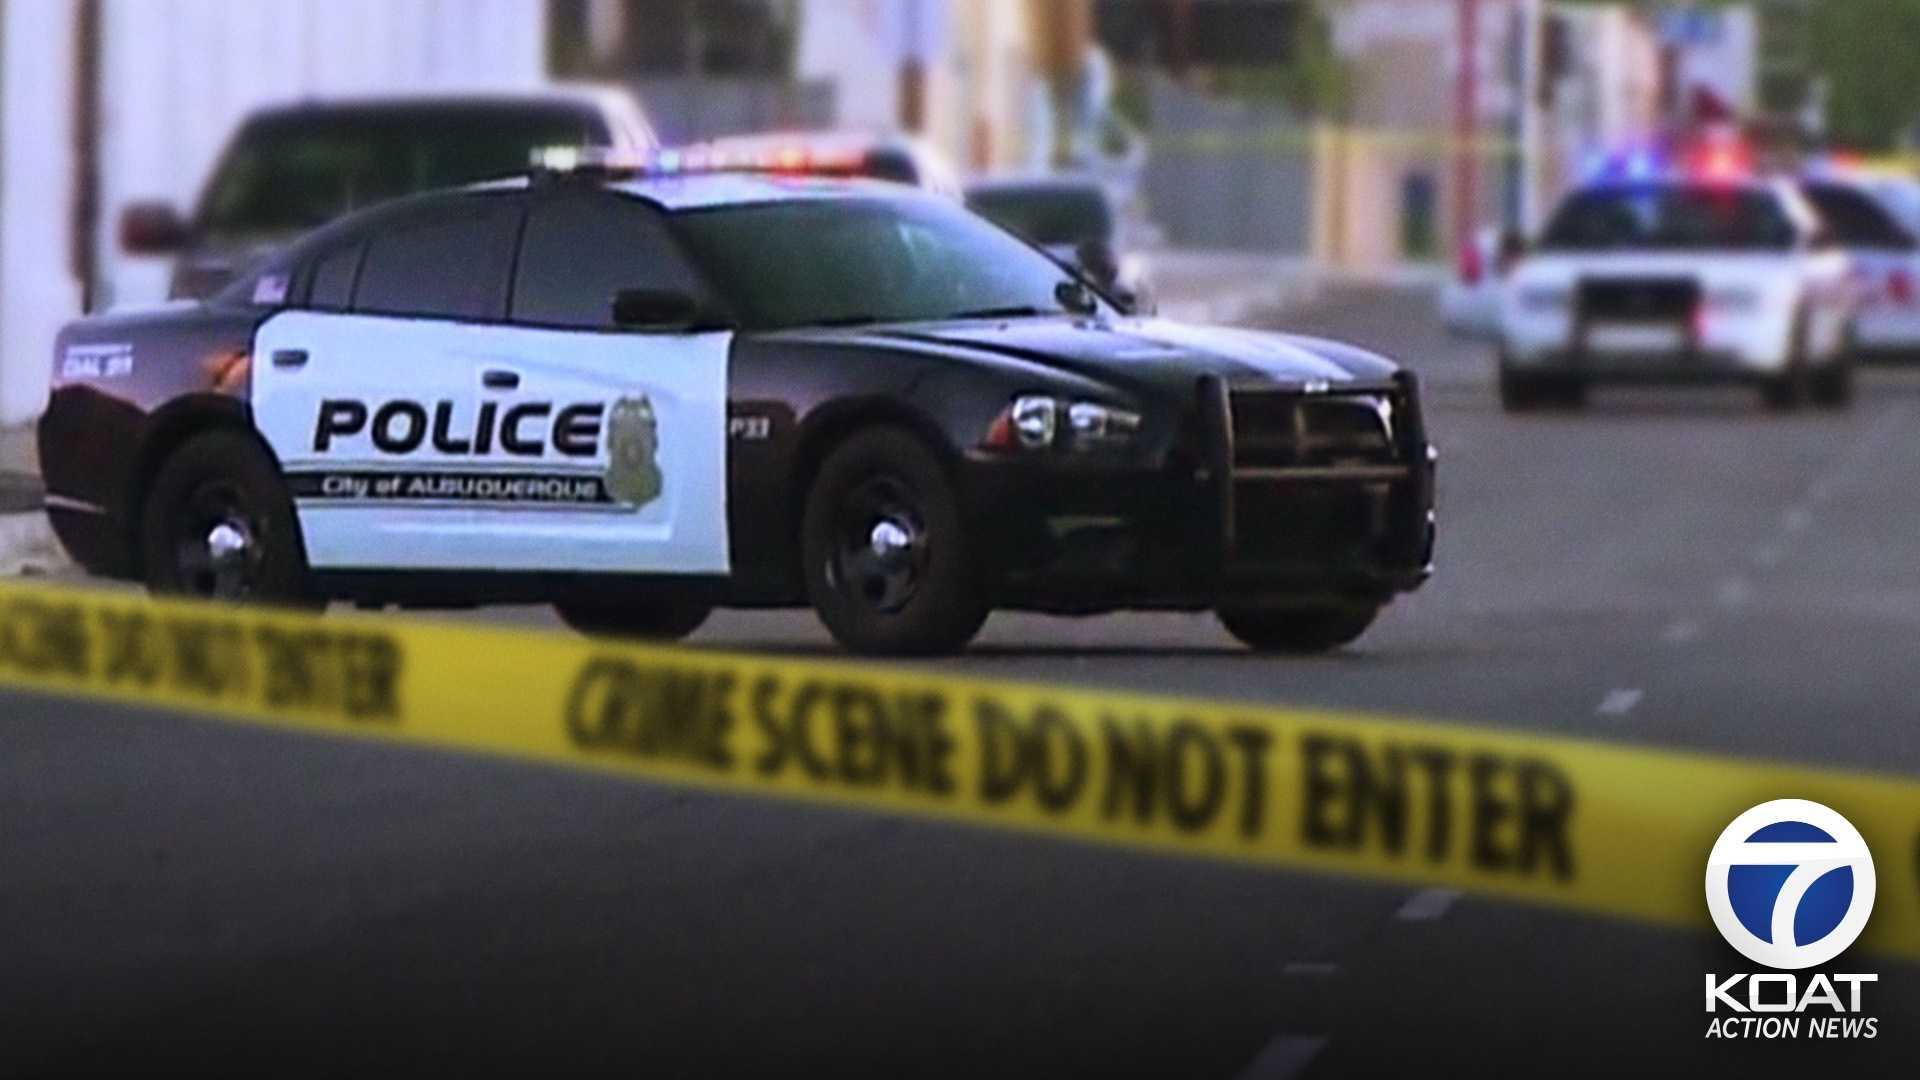 APD Police Generic Day Light Scene.jpg